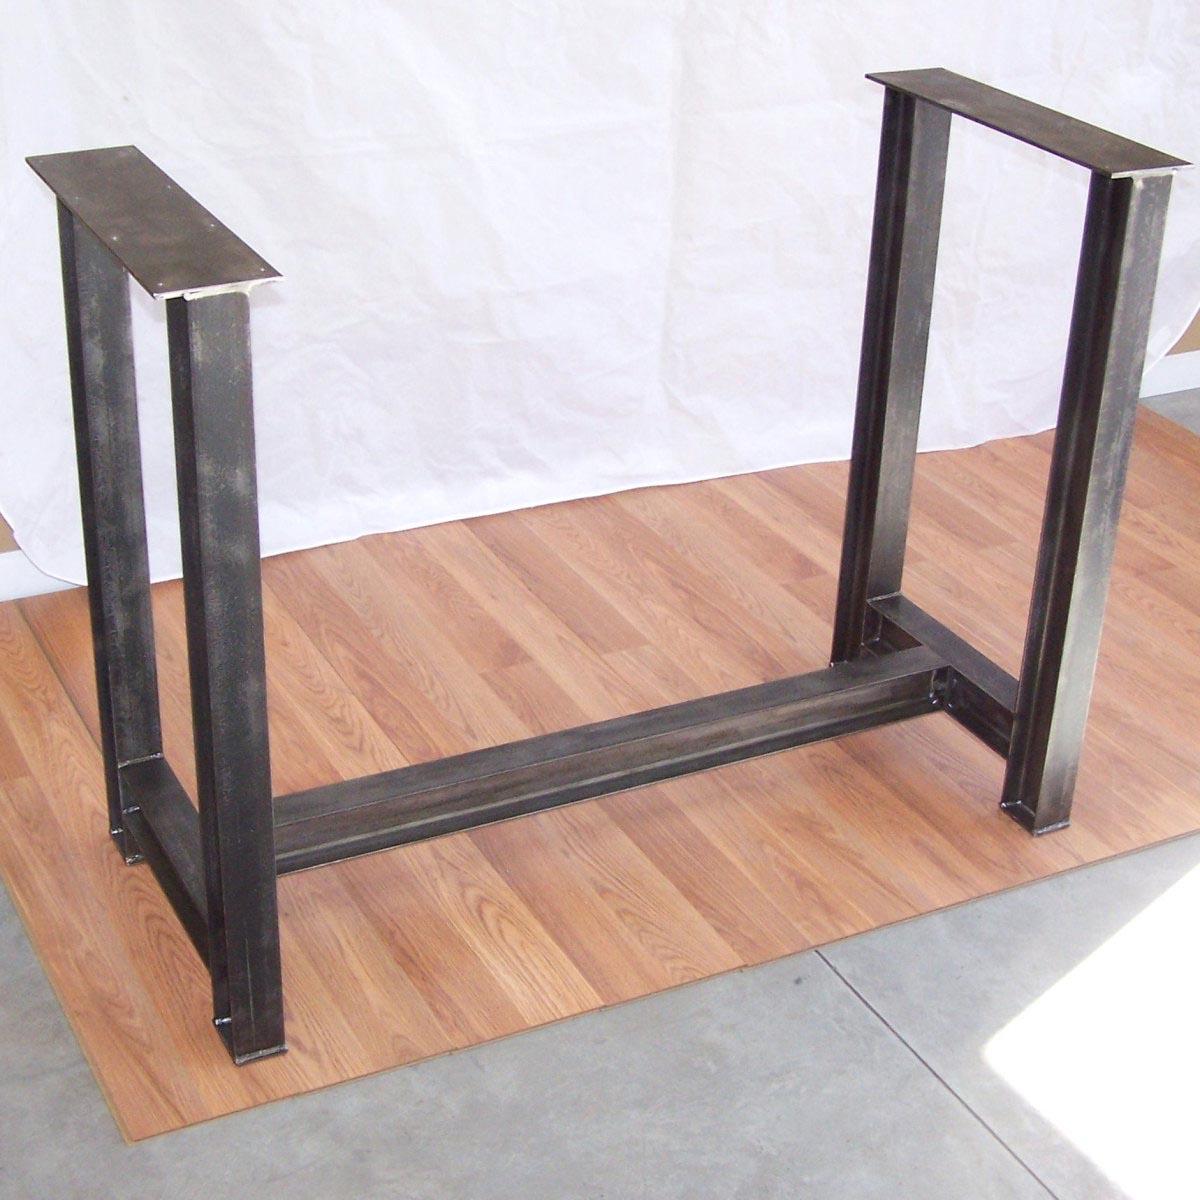 Furniture Legs Metal Contemporary modern metal furniture leg hf 102 buy modern metal furniture leg